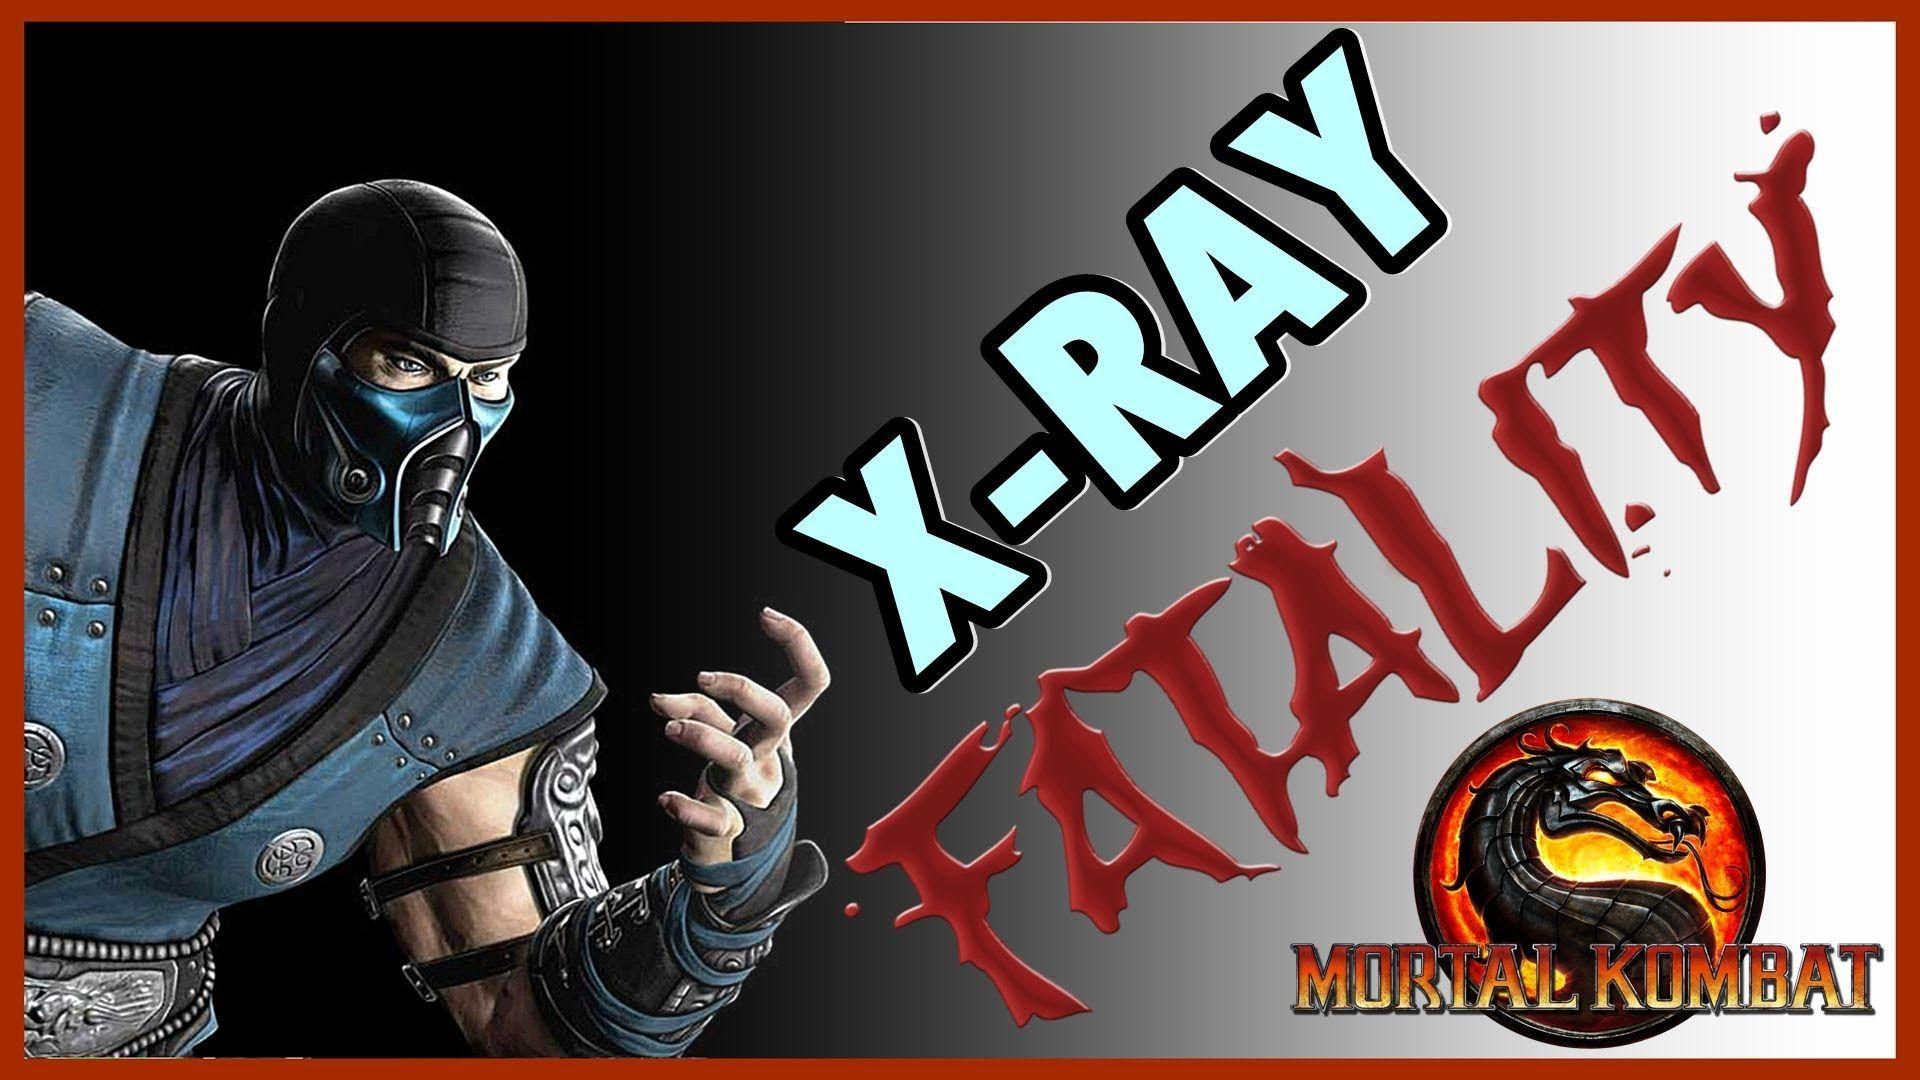 Mortal Kombat 9 Komplete Edition ( PS3 ) : Sub Zero